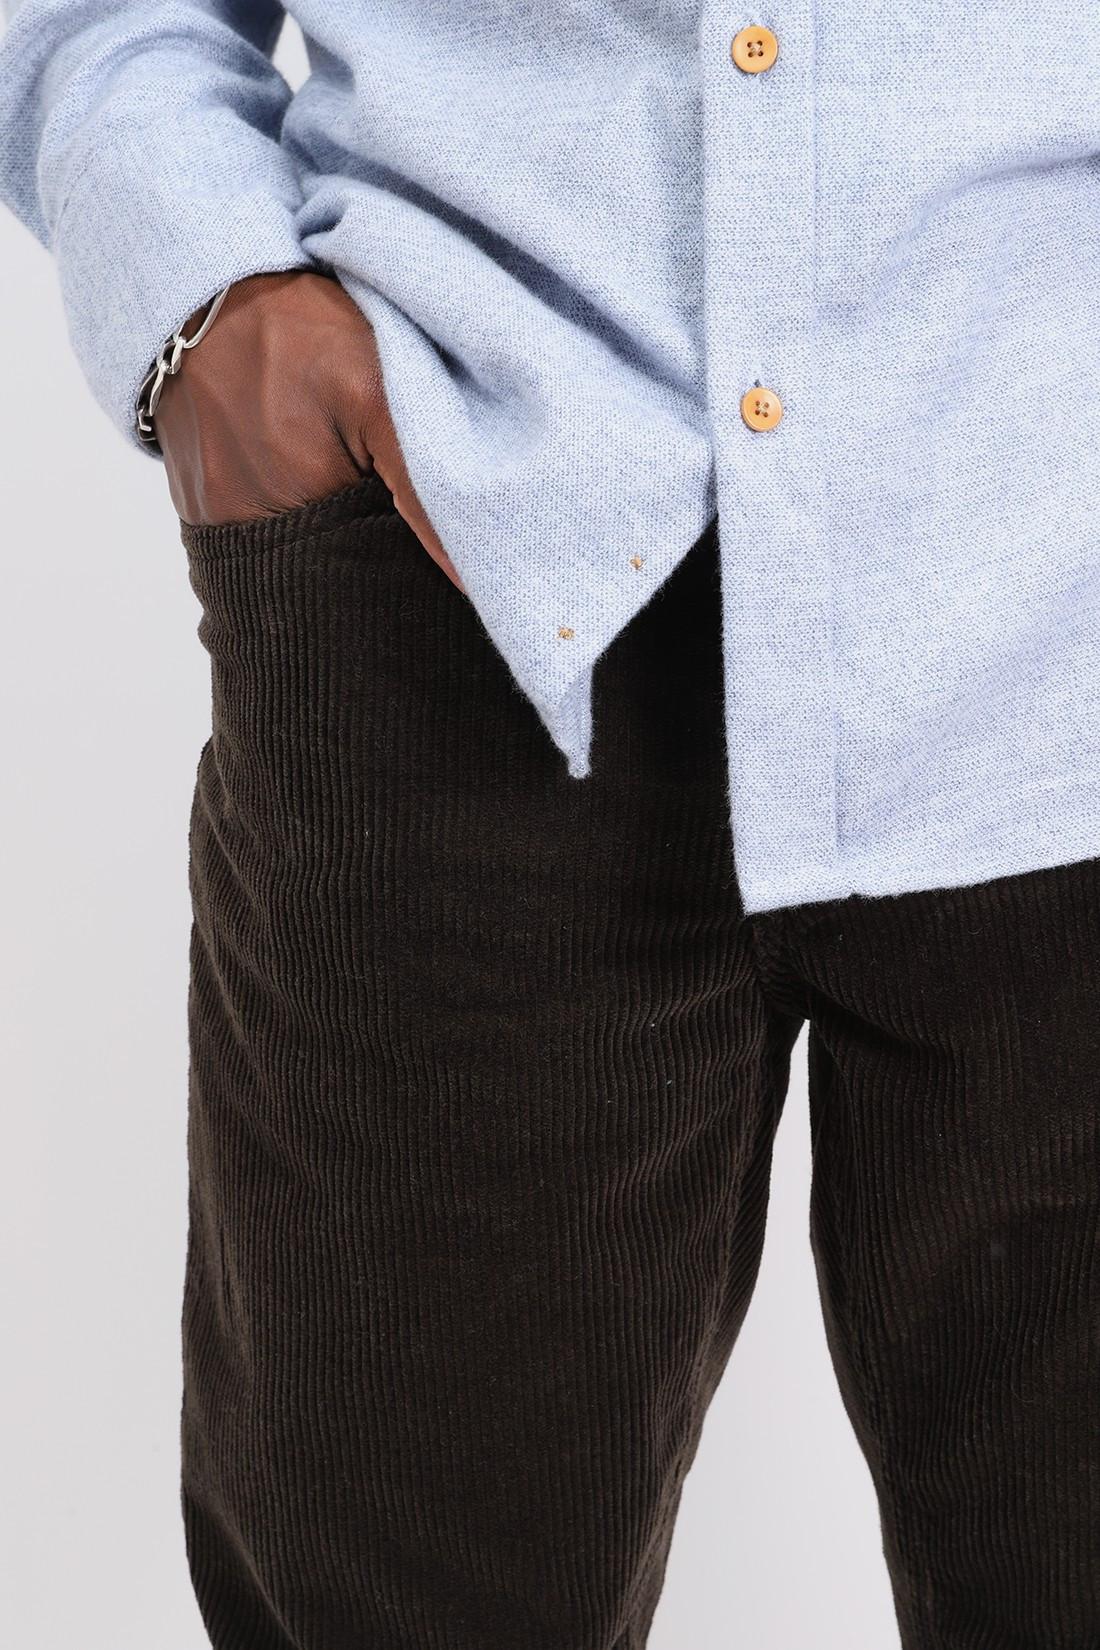 CARHARTT WIP / Newel pant cord Tobacco